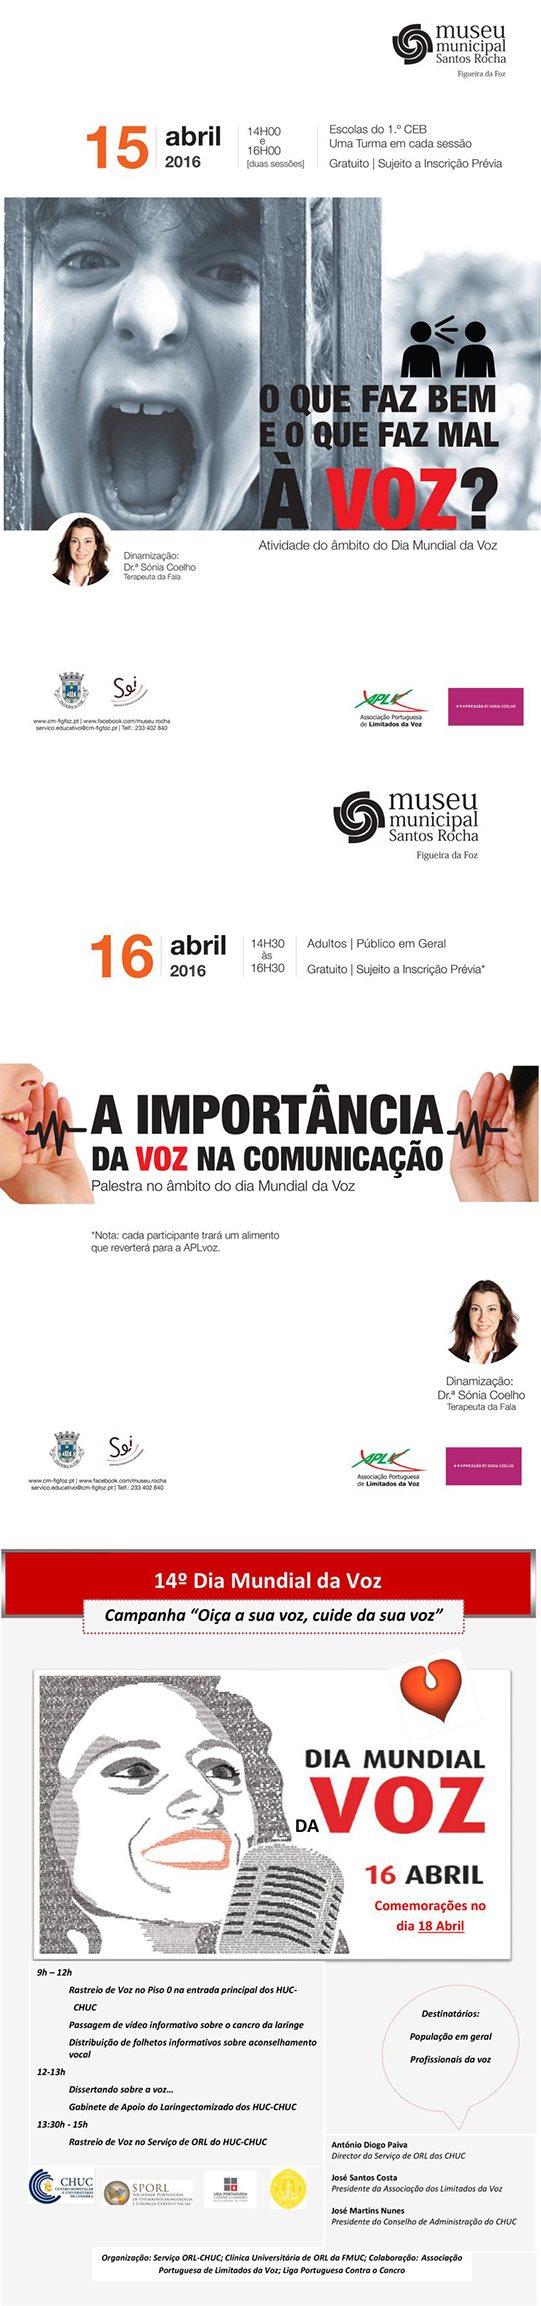 img_dia_mundial_da_voz_2016